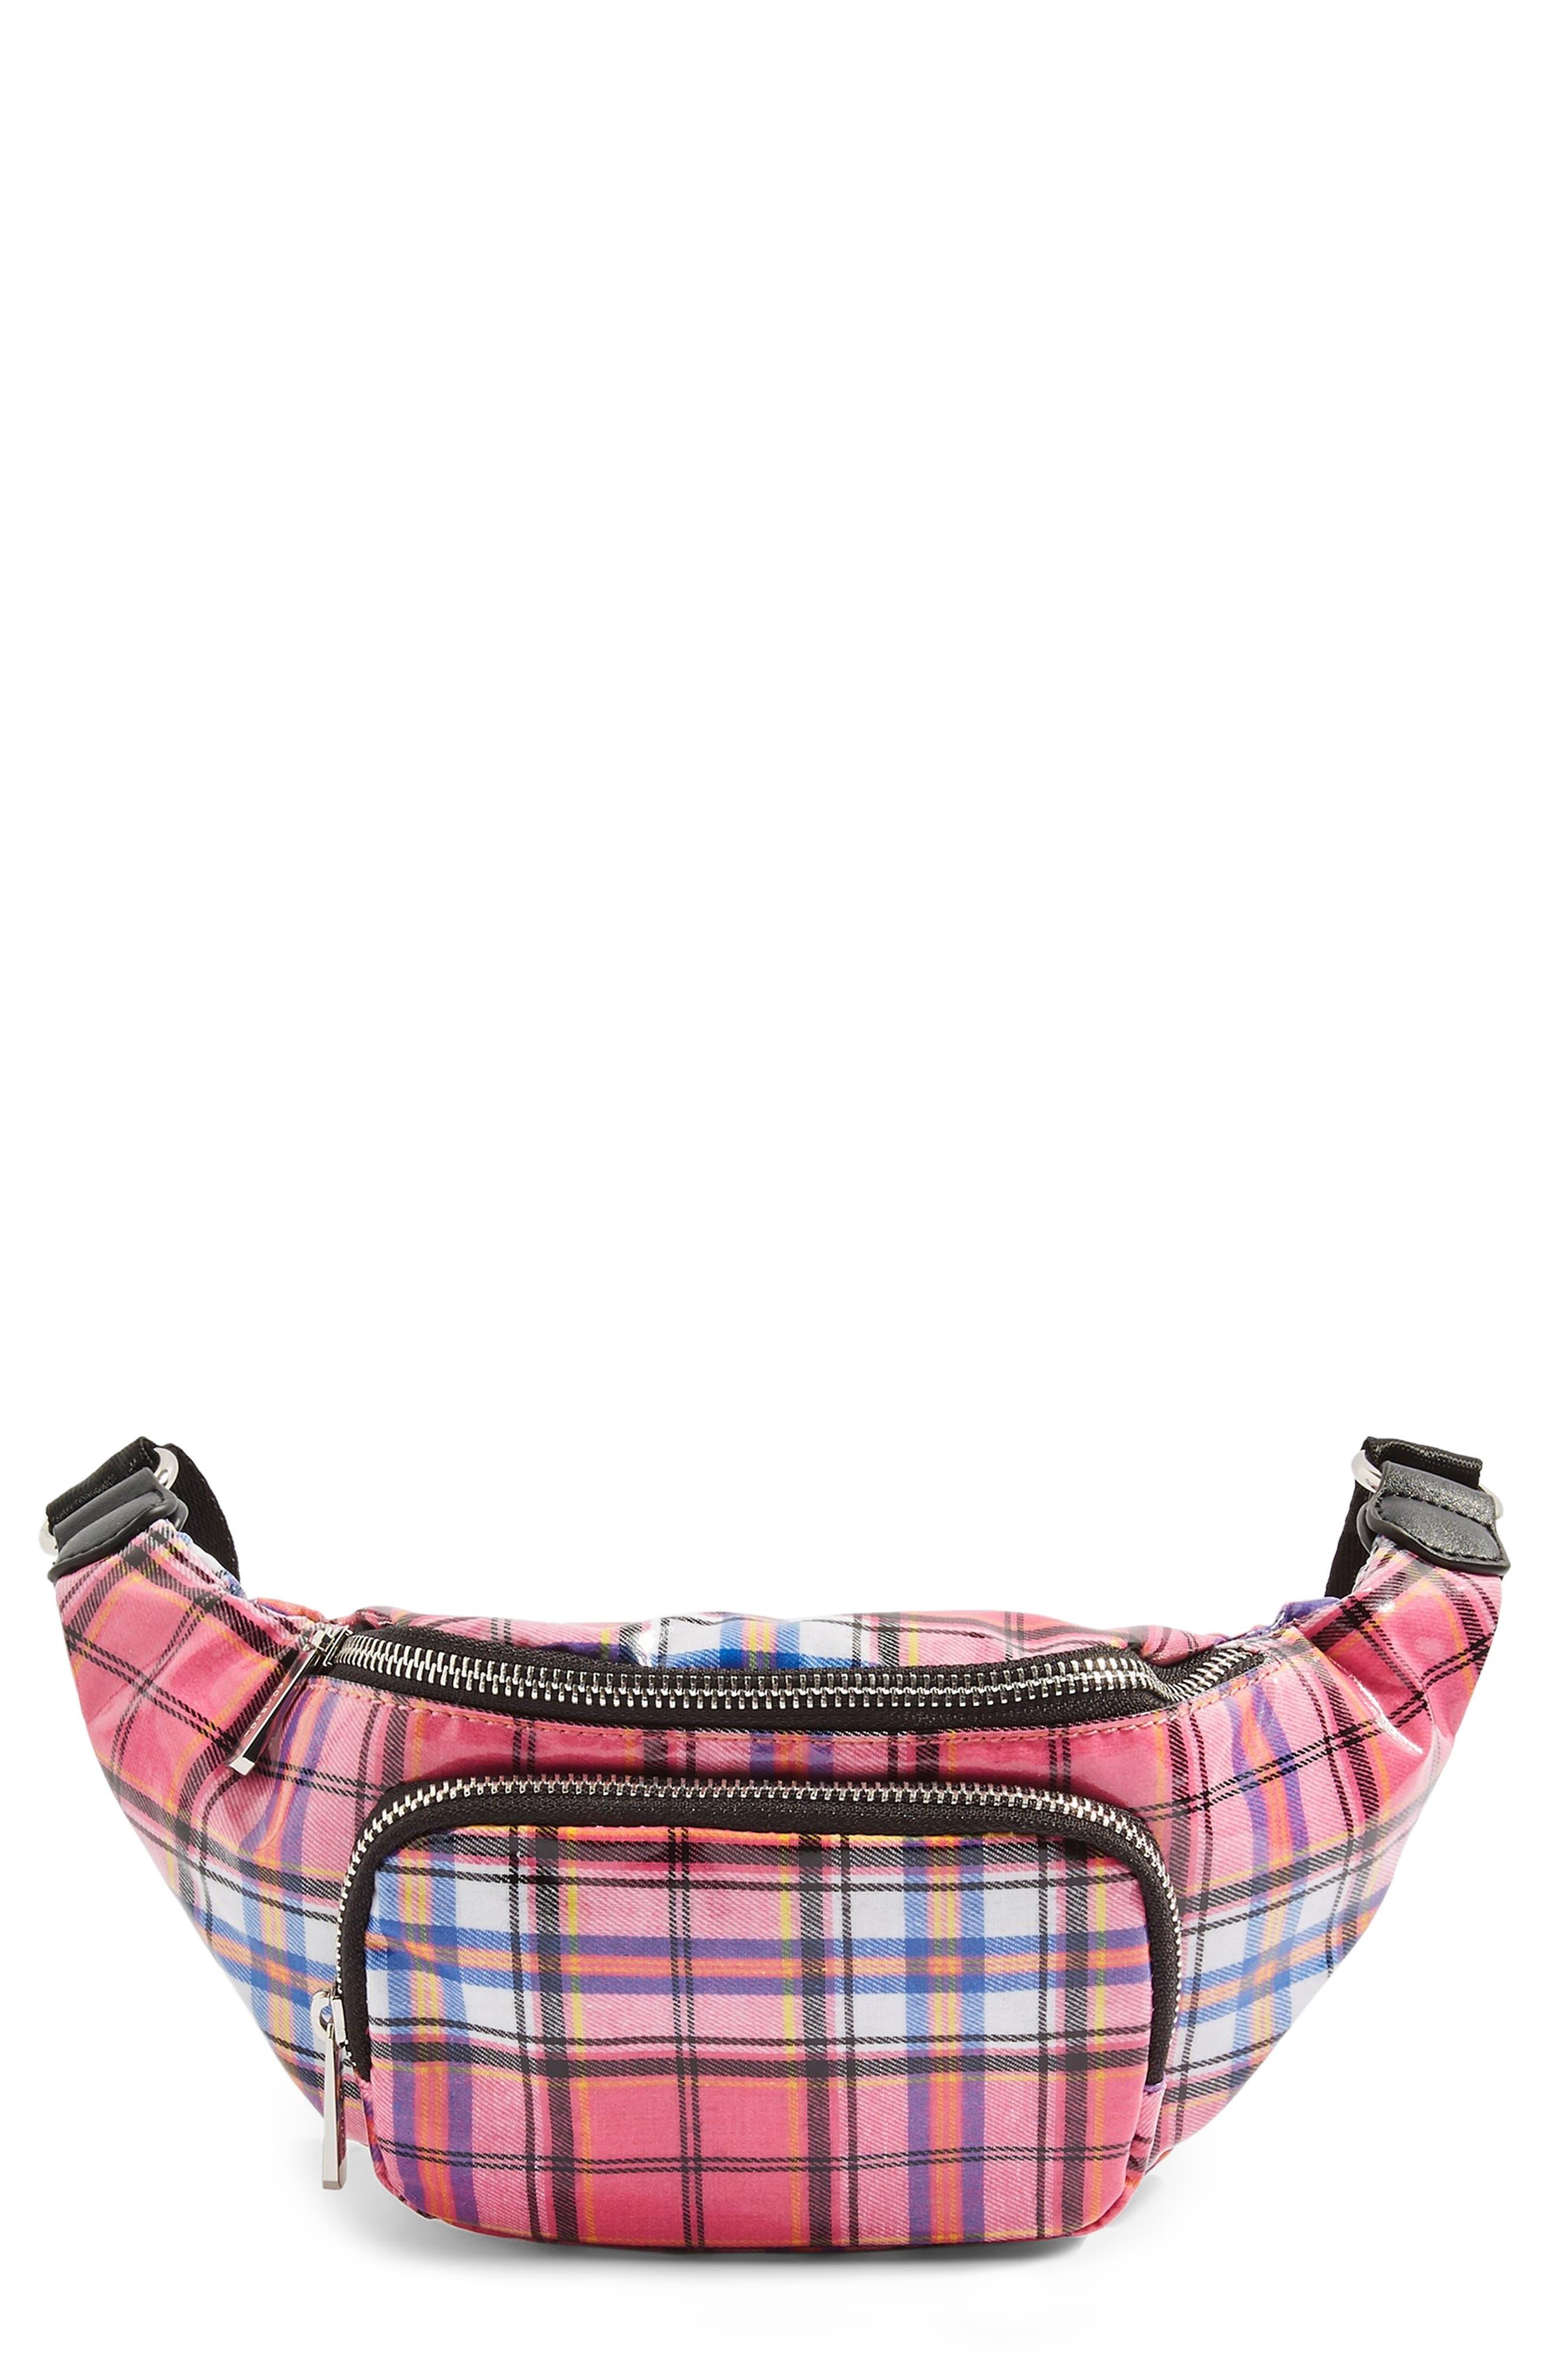 Callie Check Belt Bag,                         Main,                         color, 650